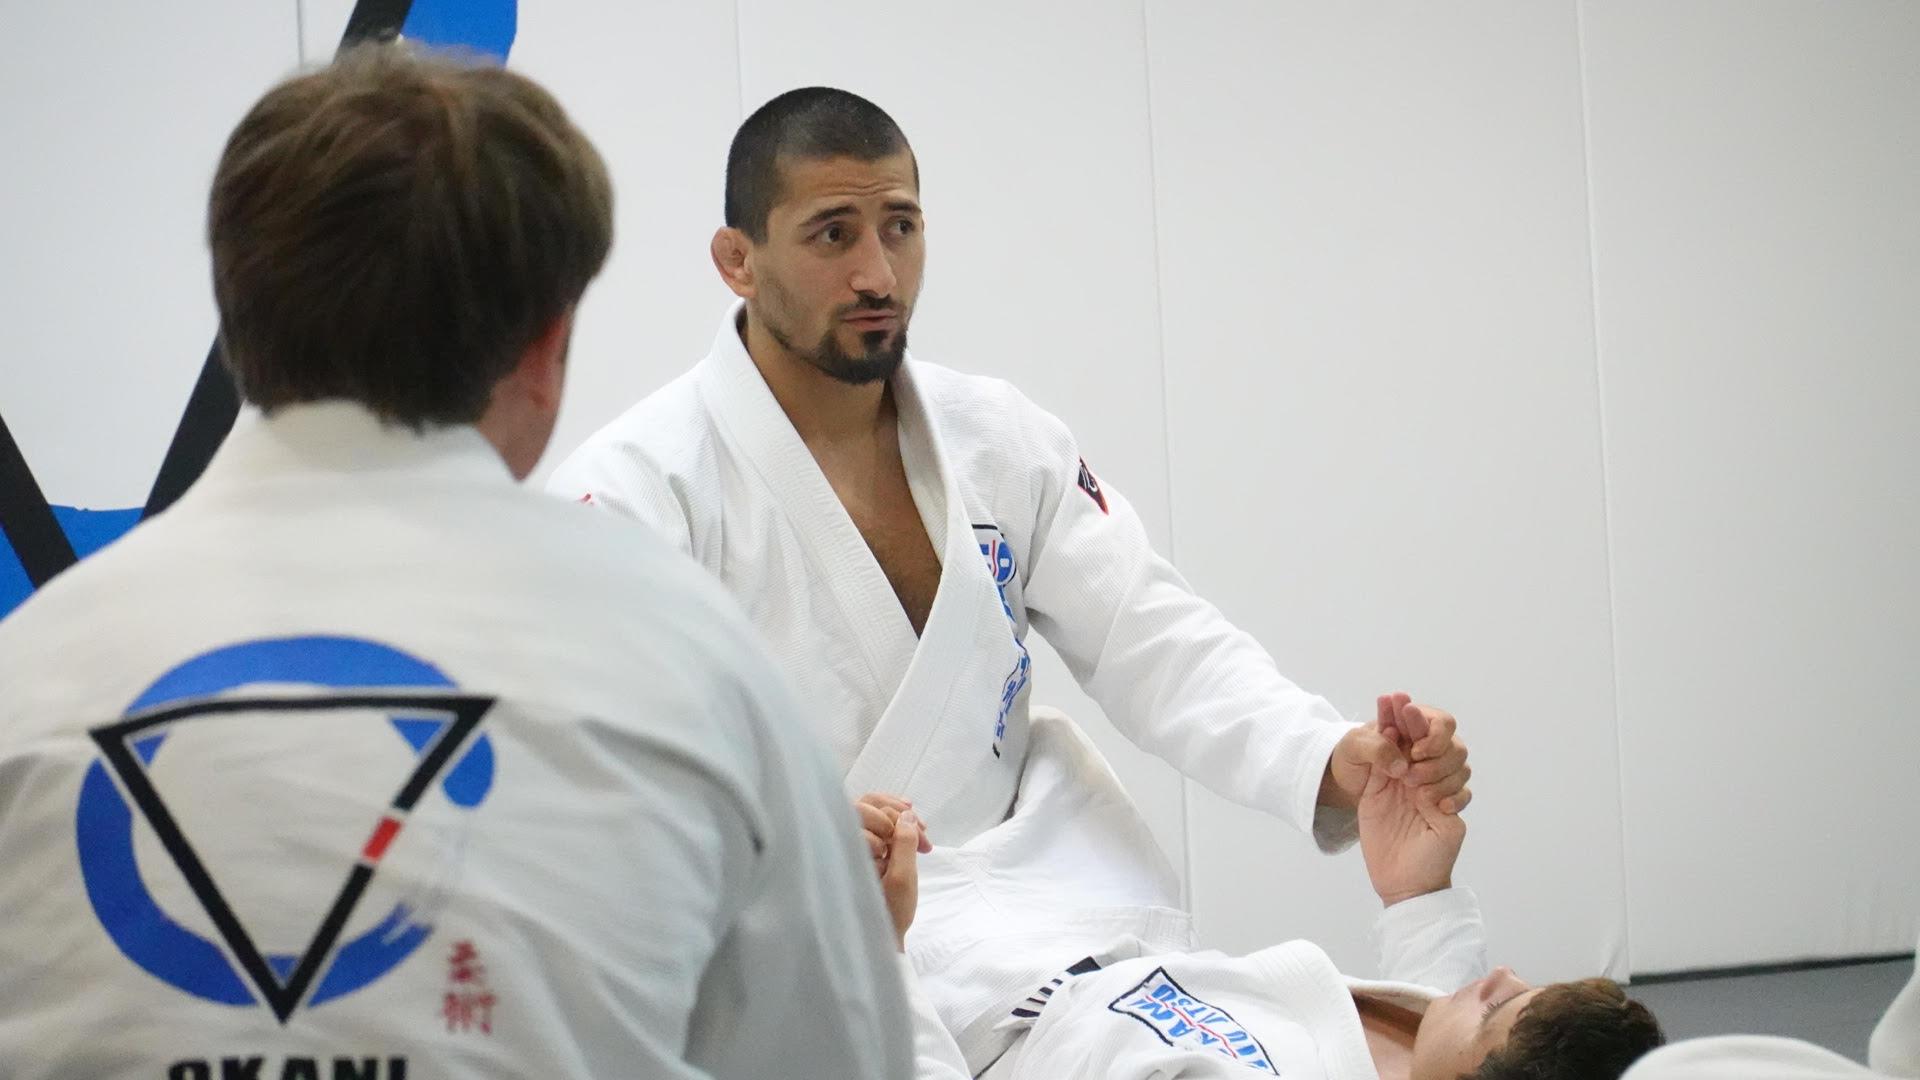 OZFit Brazilian Jiu Jitsu Classes in Bergen County - Gym in Waldwick NJ (1).jpg